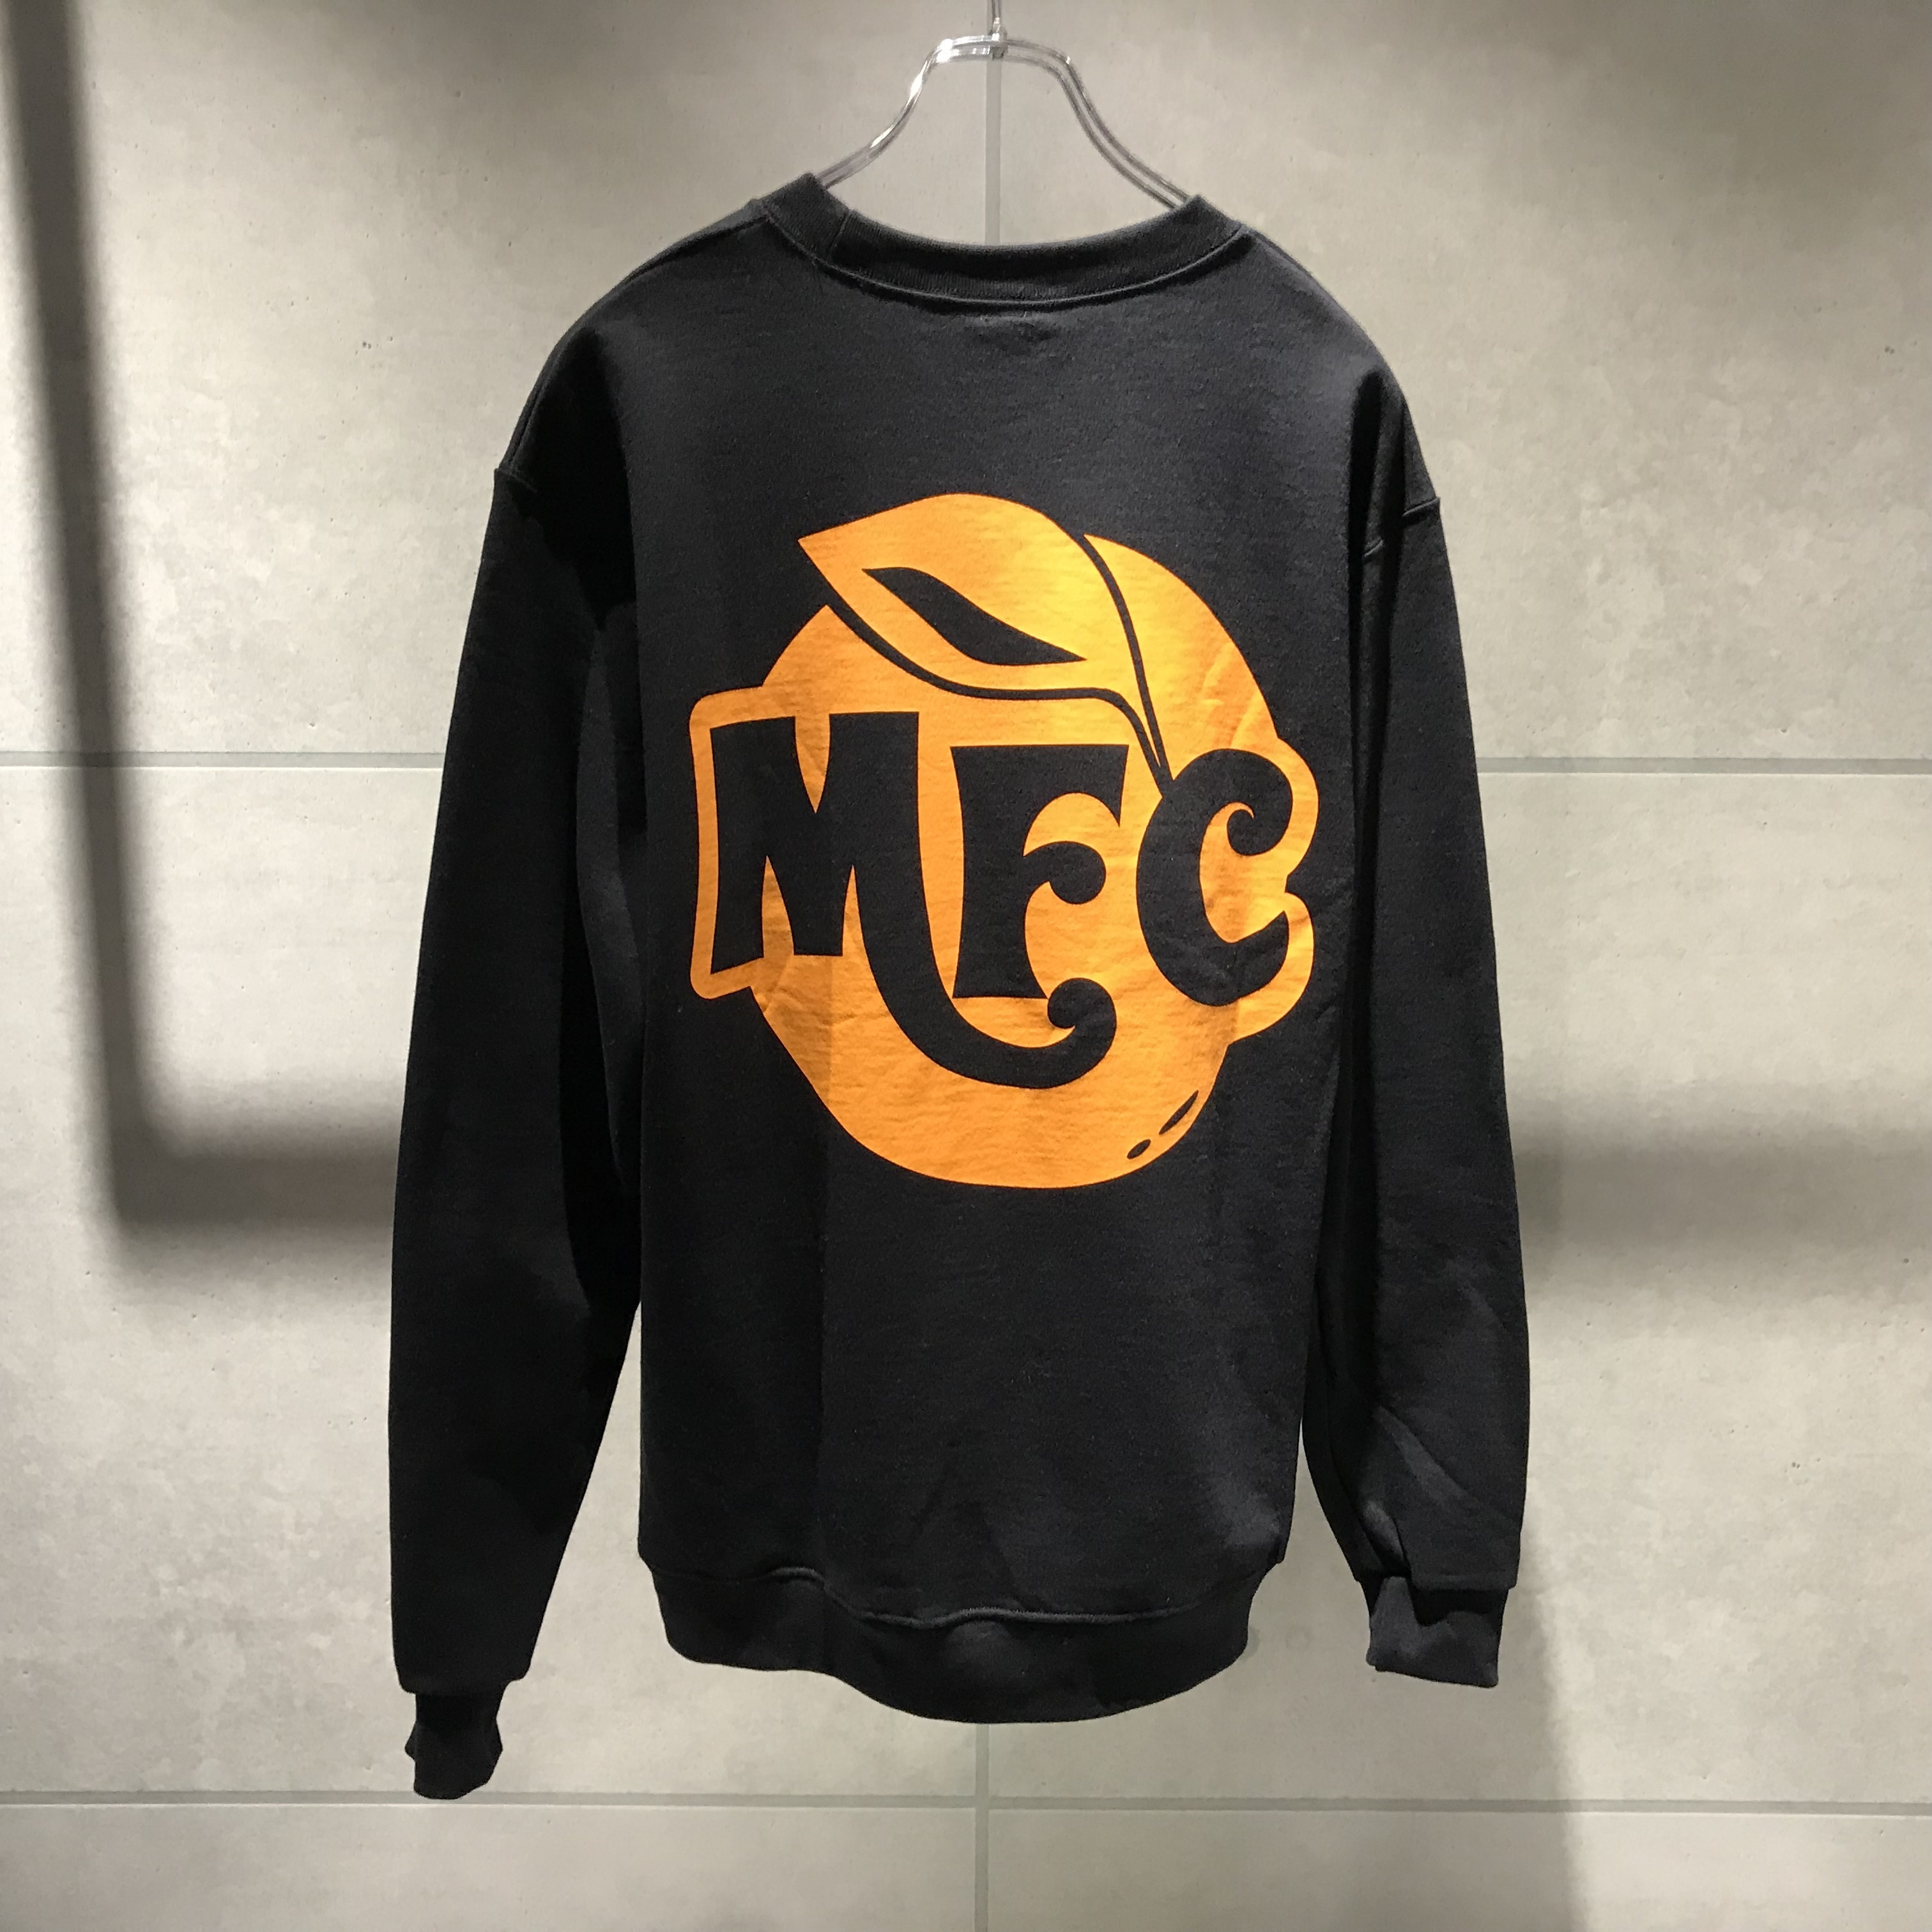 MFC STORE TYPE 8 CREWNECK SWEATSHIRT / BLACK x ORANGE